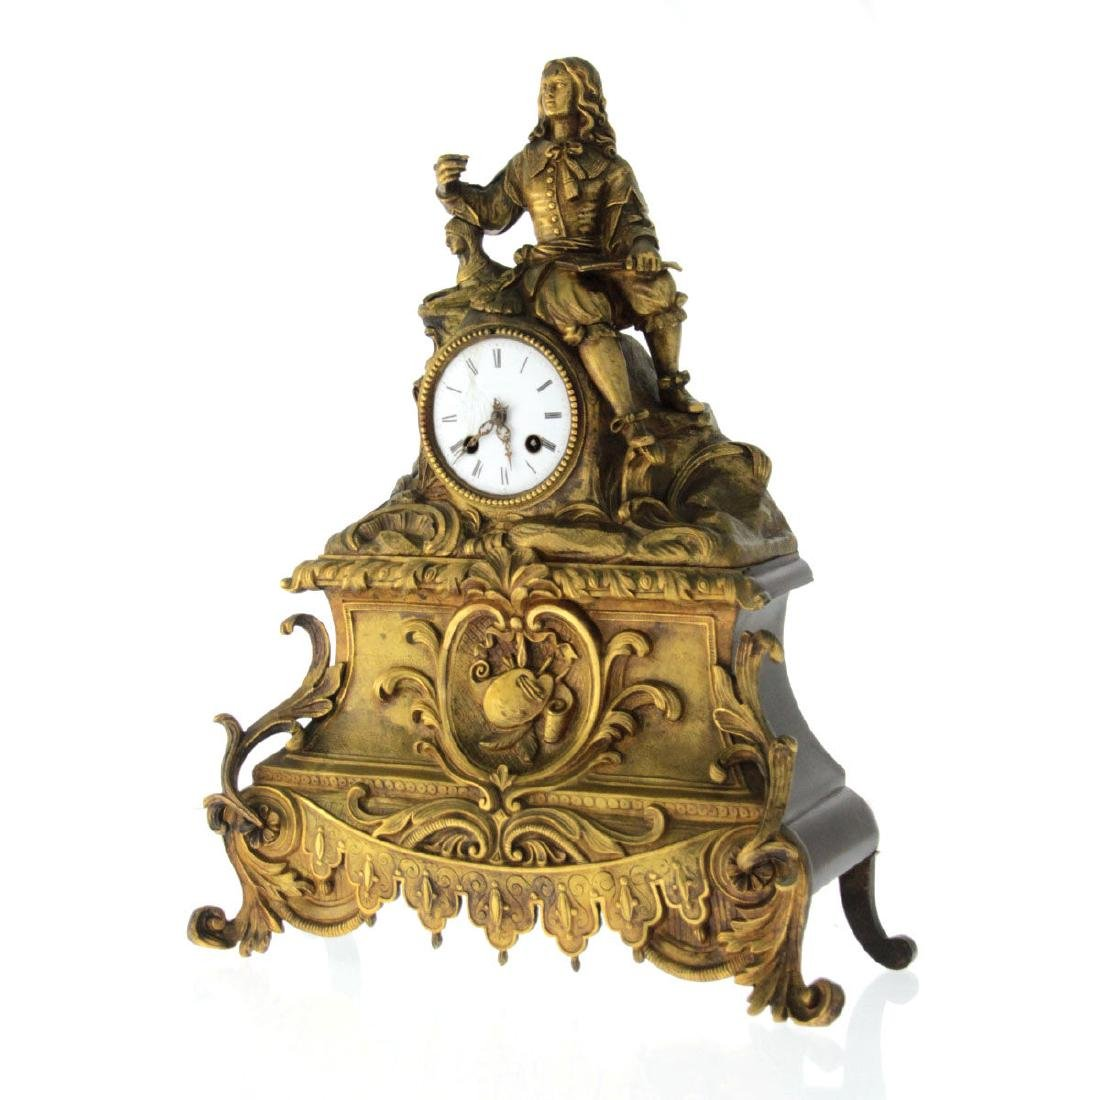 French Brass Mantel Clock, 19th Century. - 4